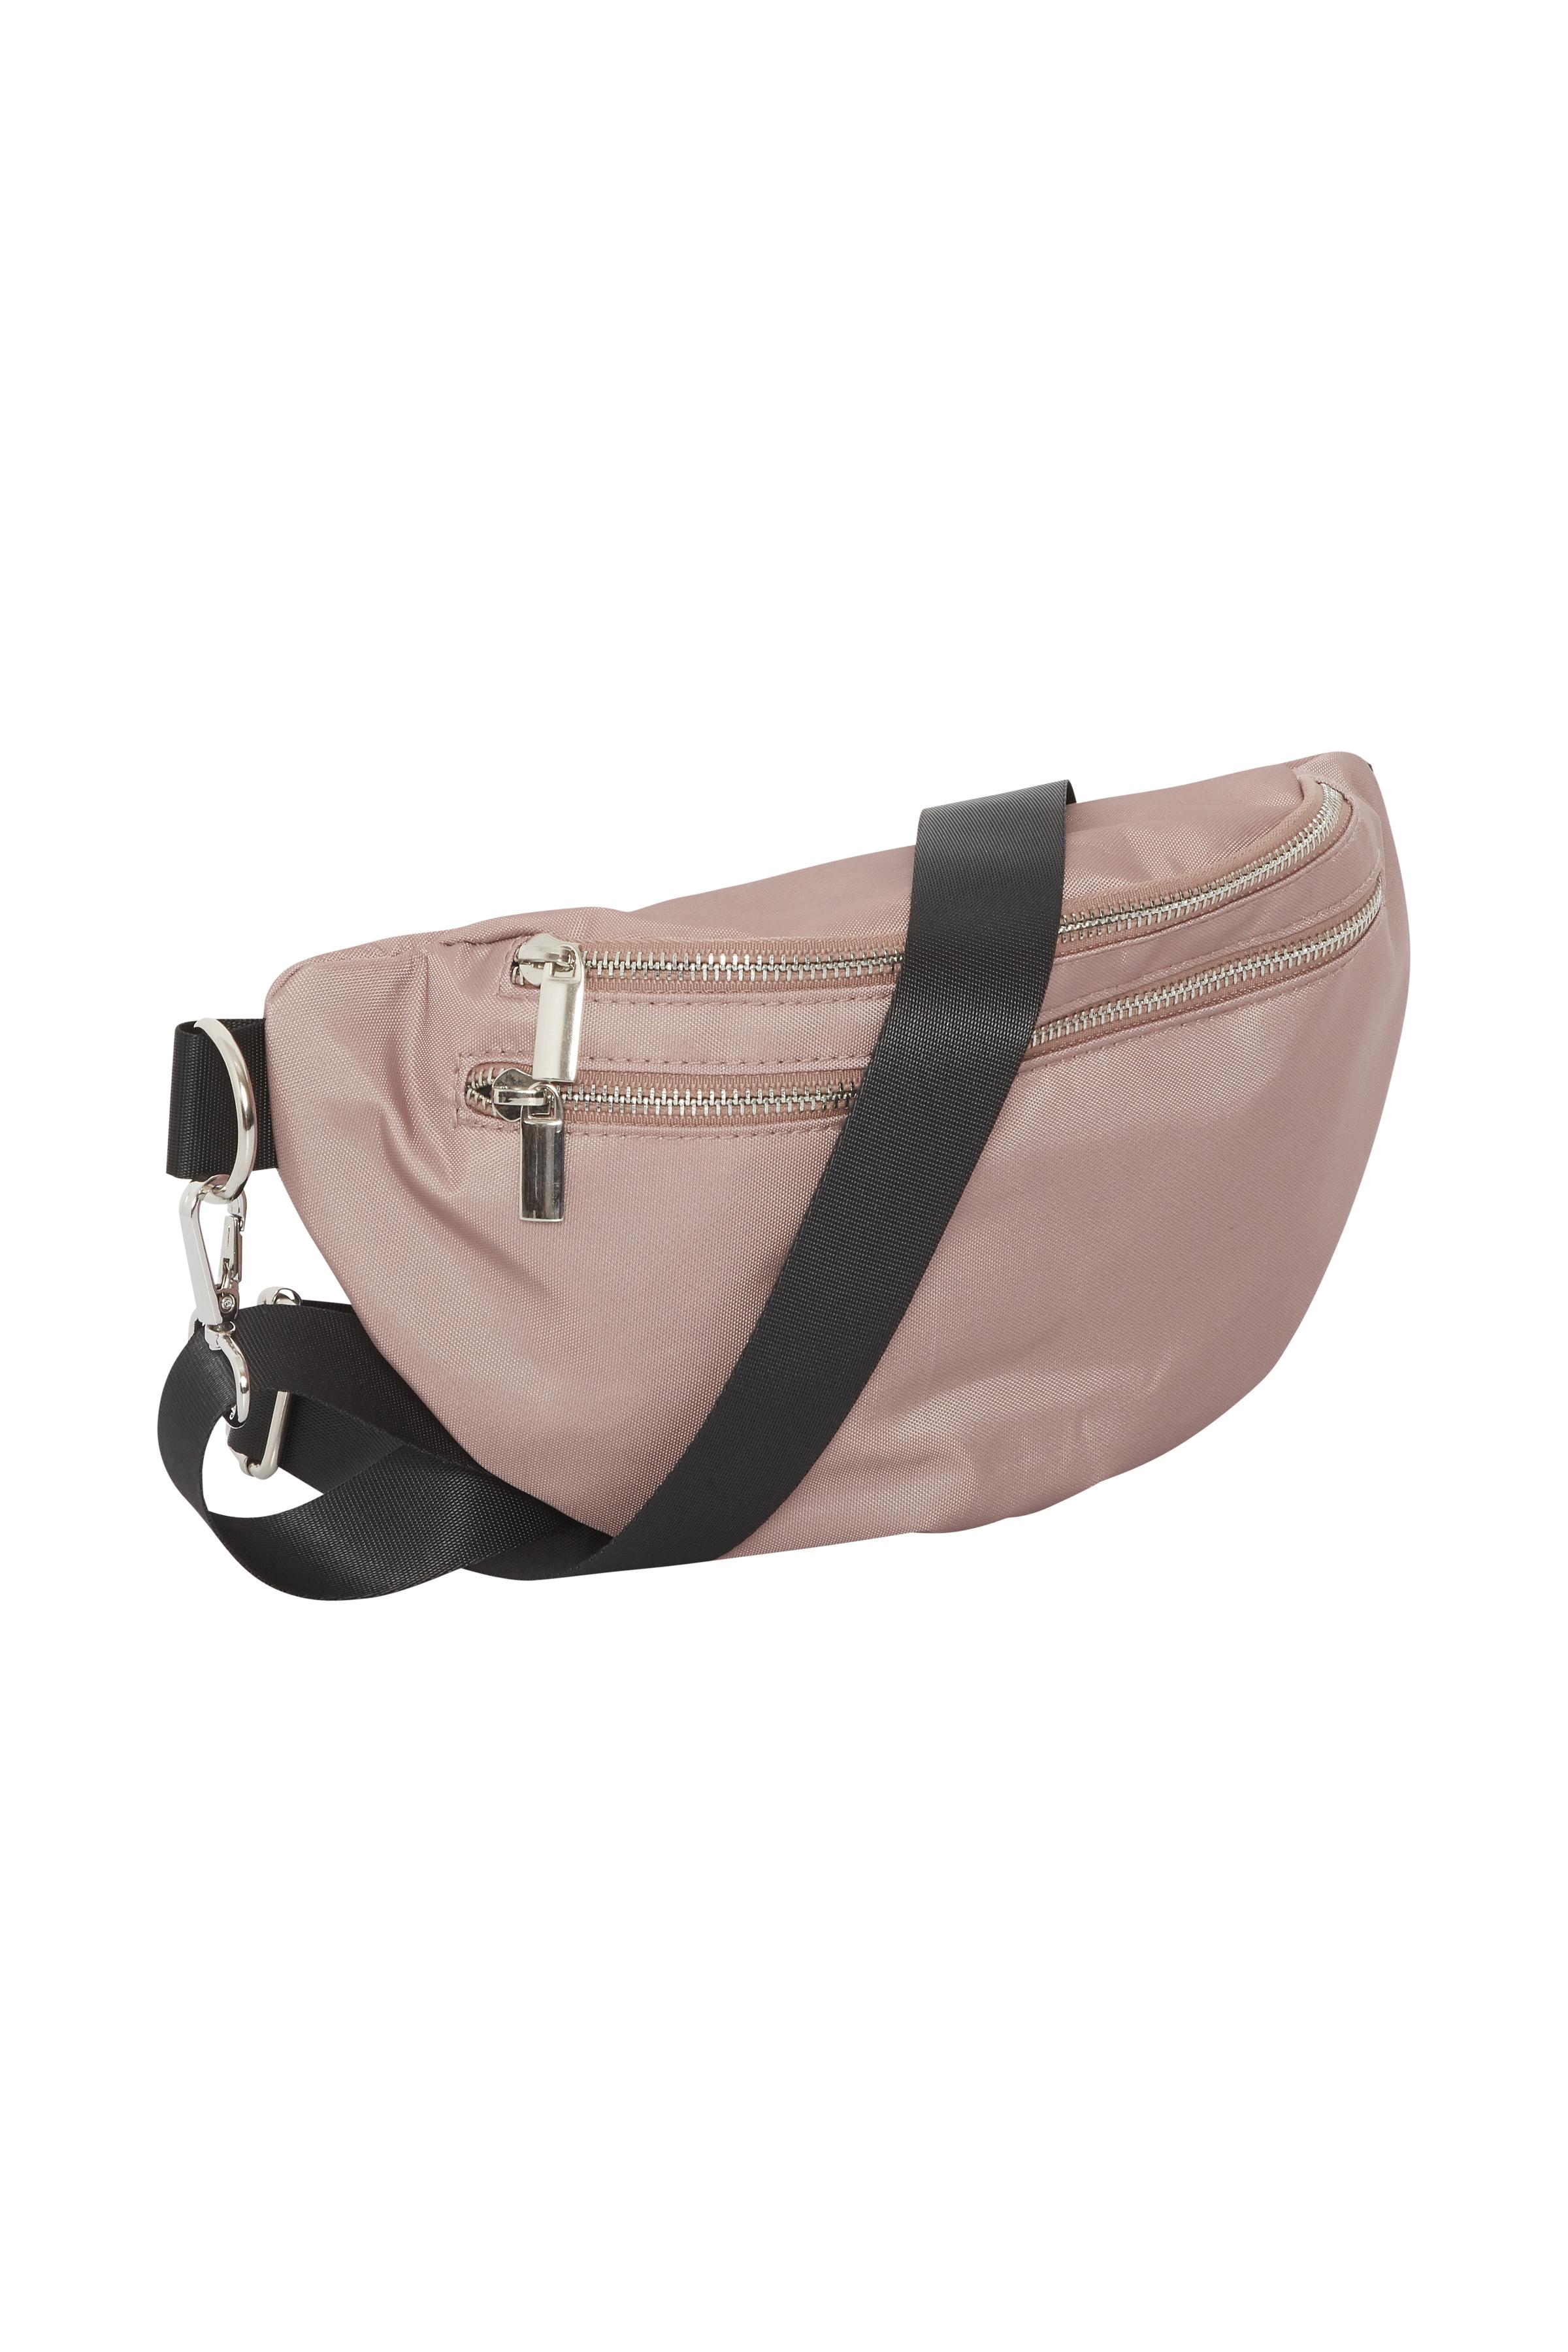 Image of   Ichi - accessories Dame Taske - Støvet rosa